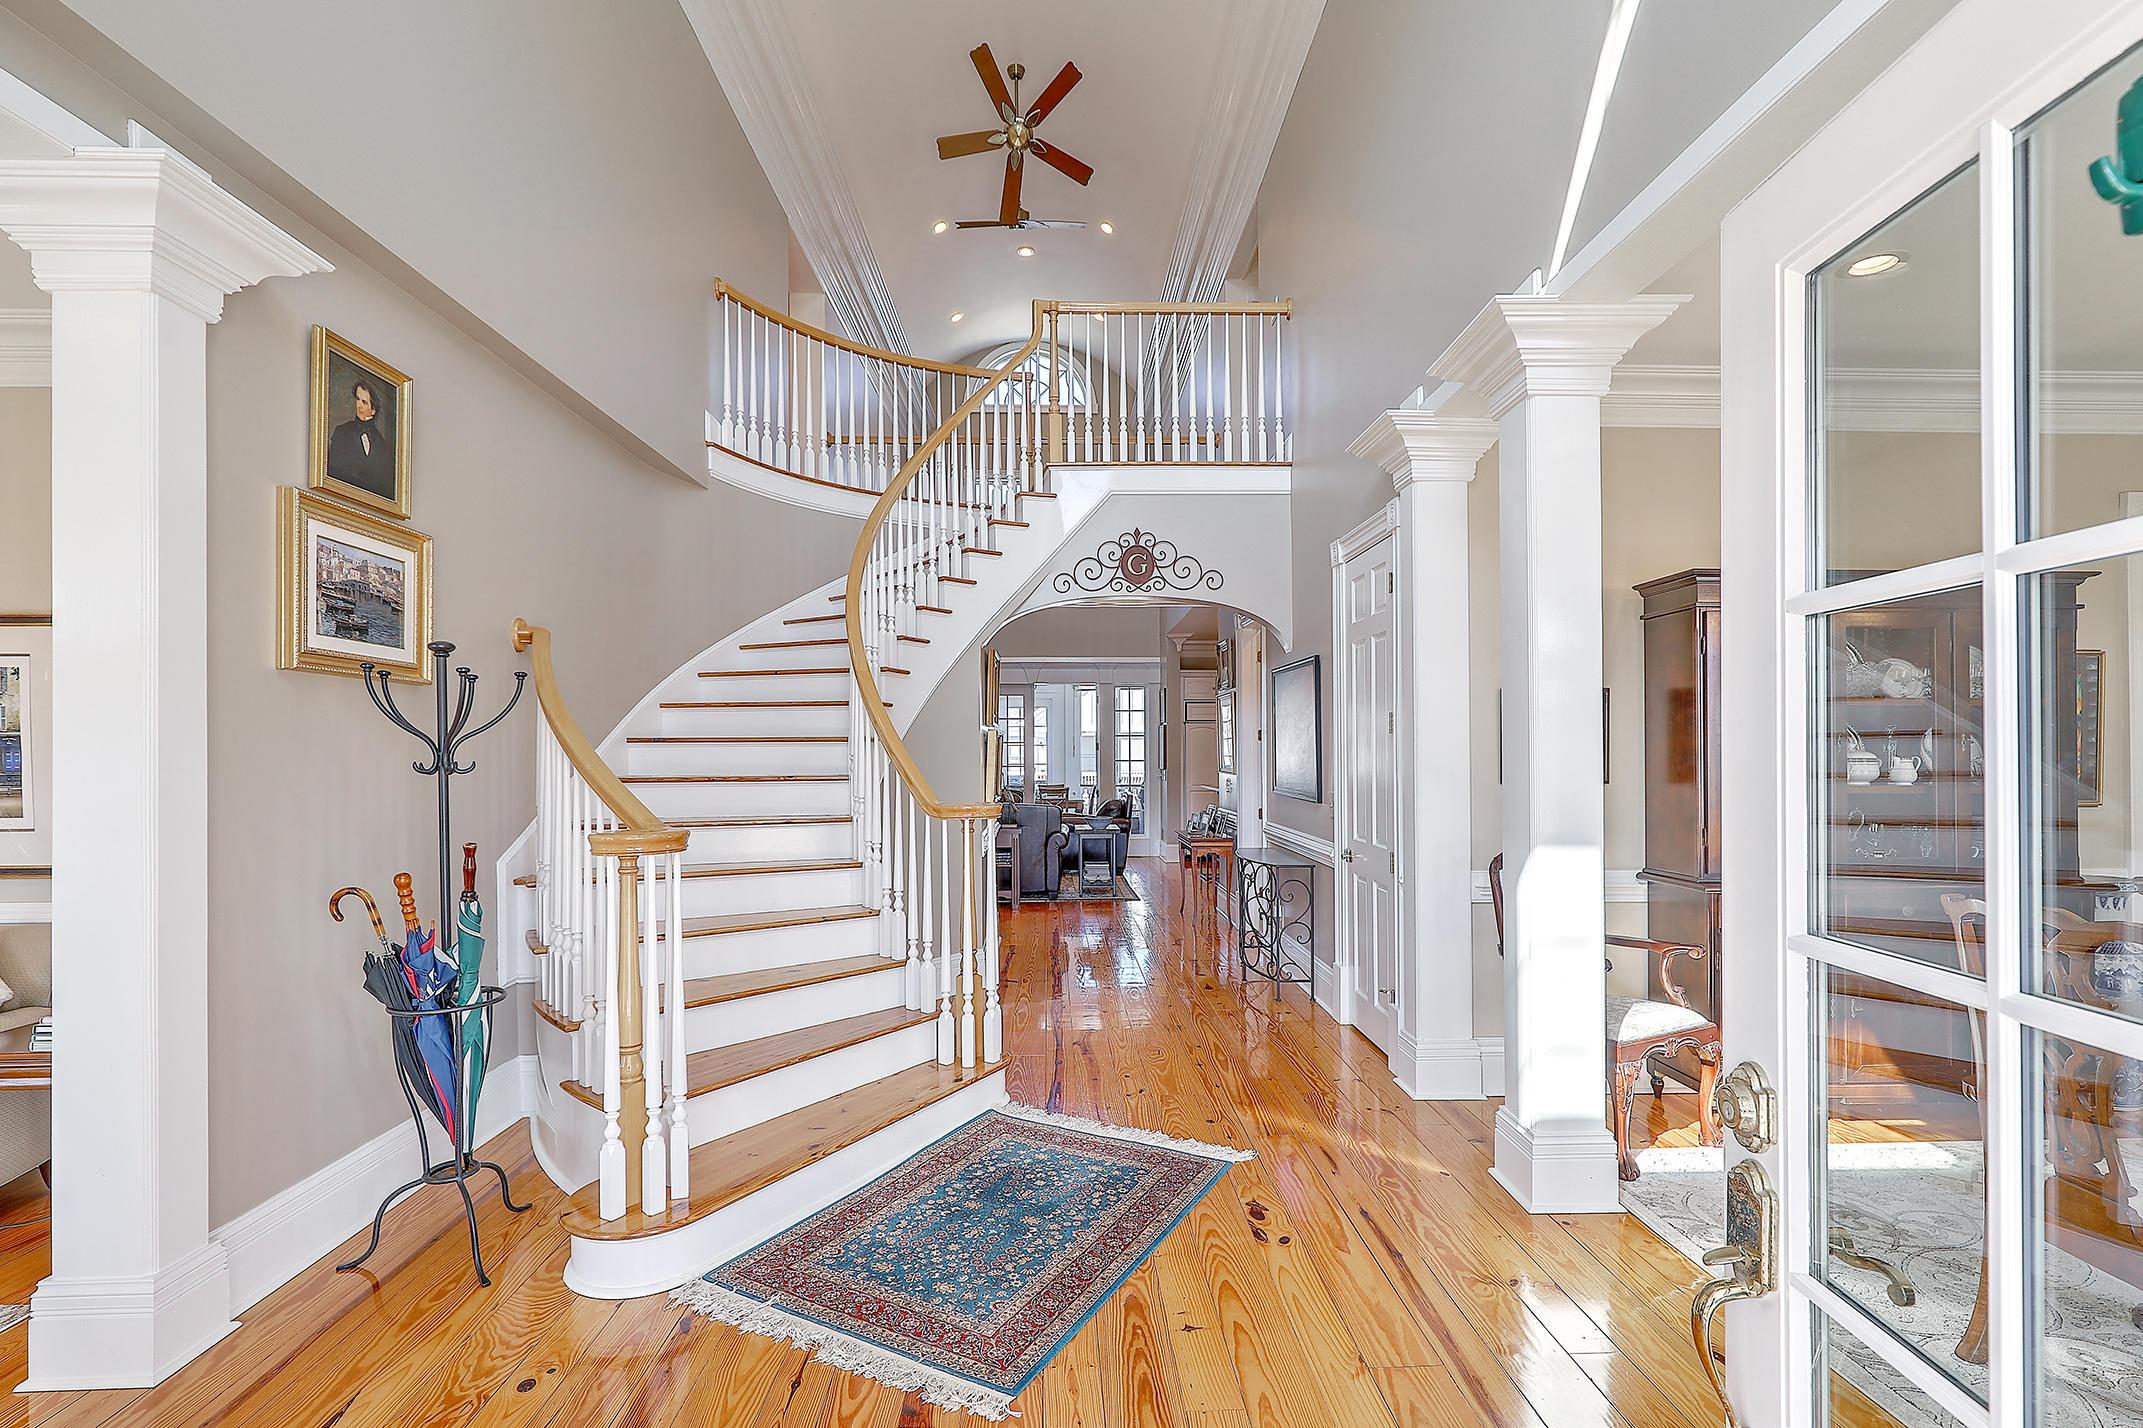 Beresford Creek Landing Homes For Sale - 1410 Creek House, Charleston, SC - 40